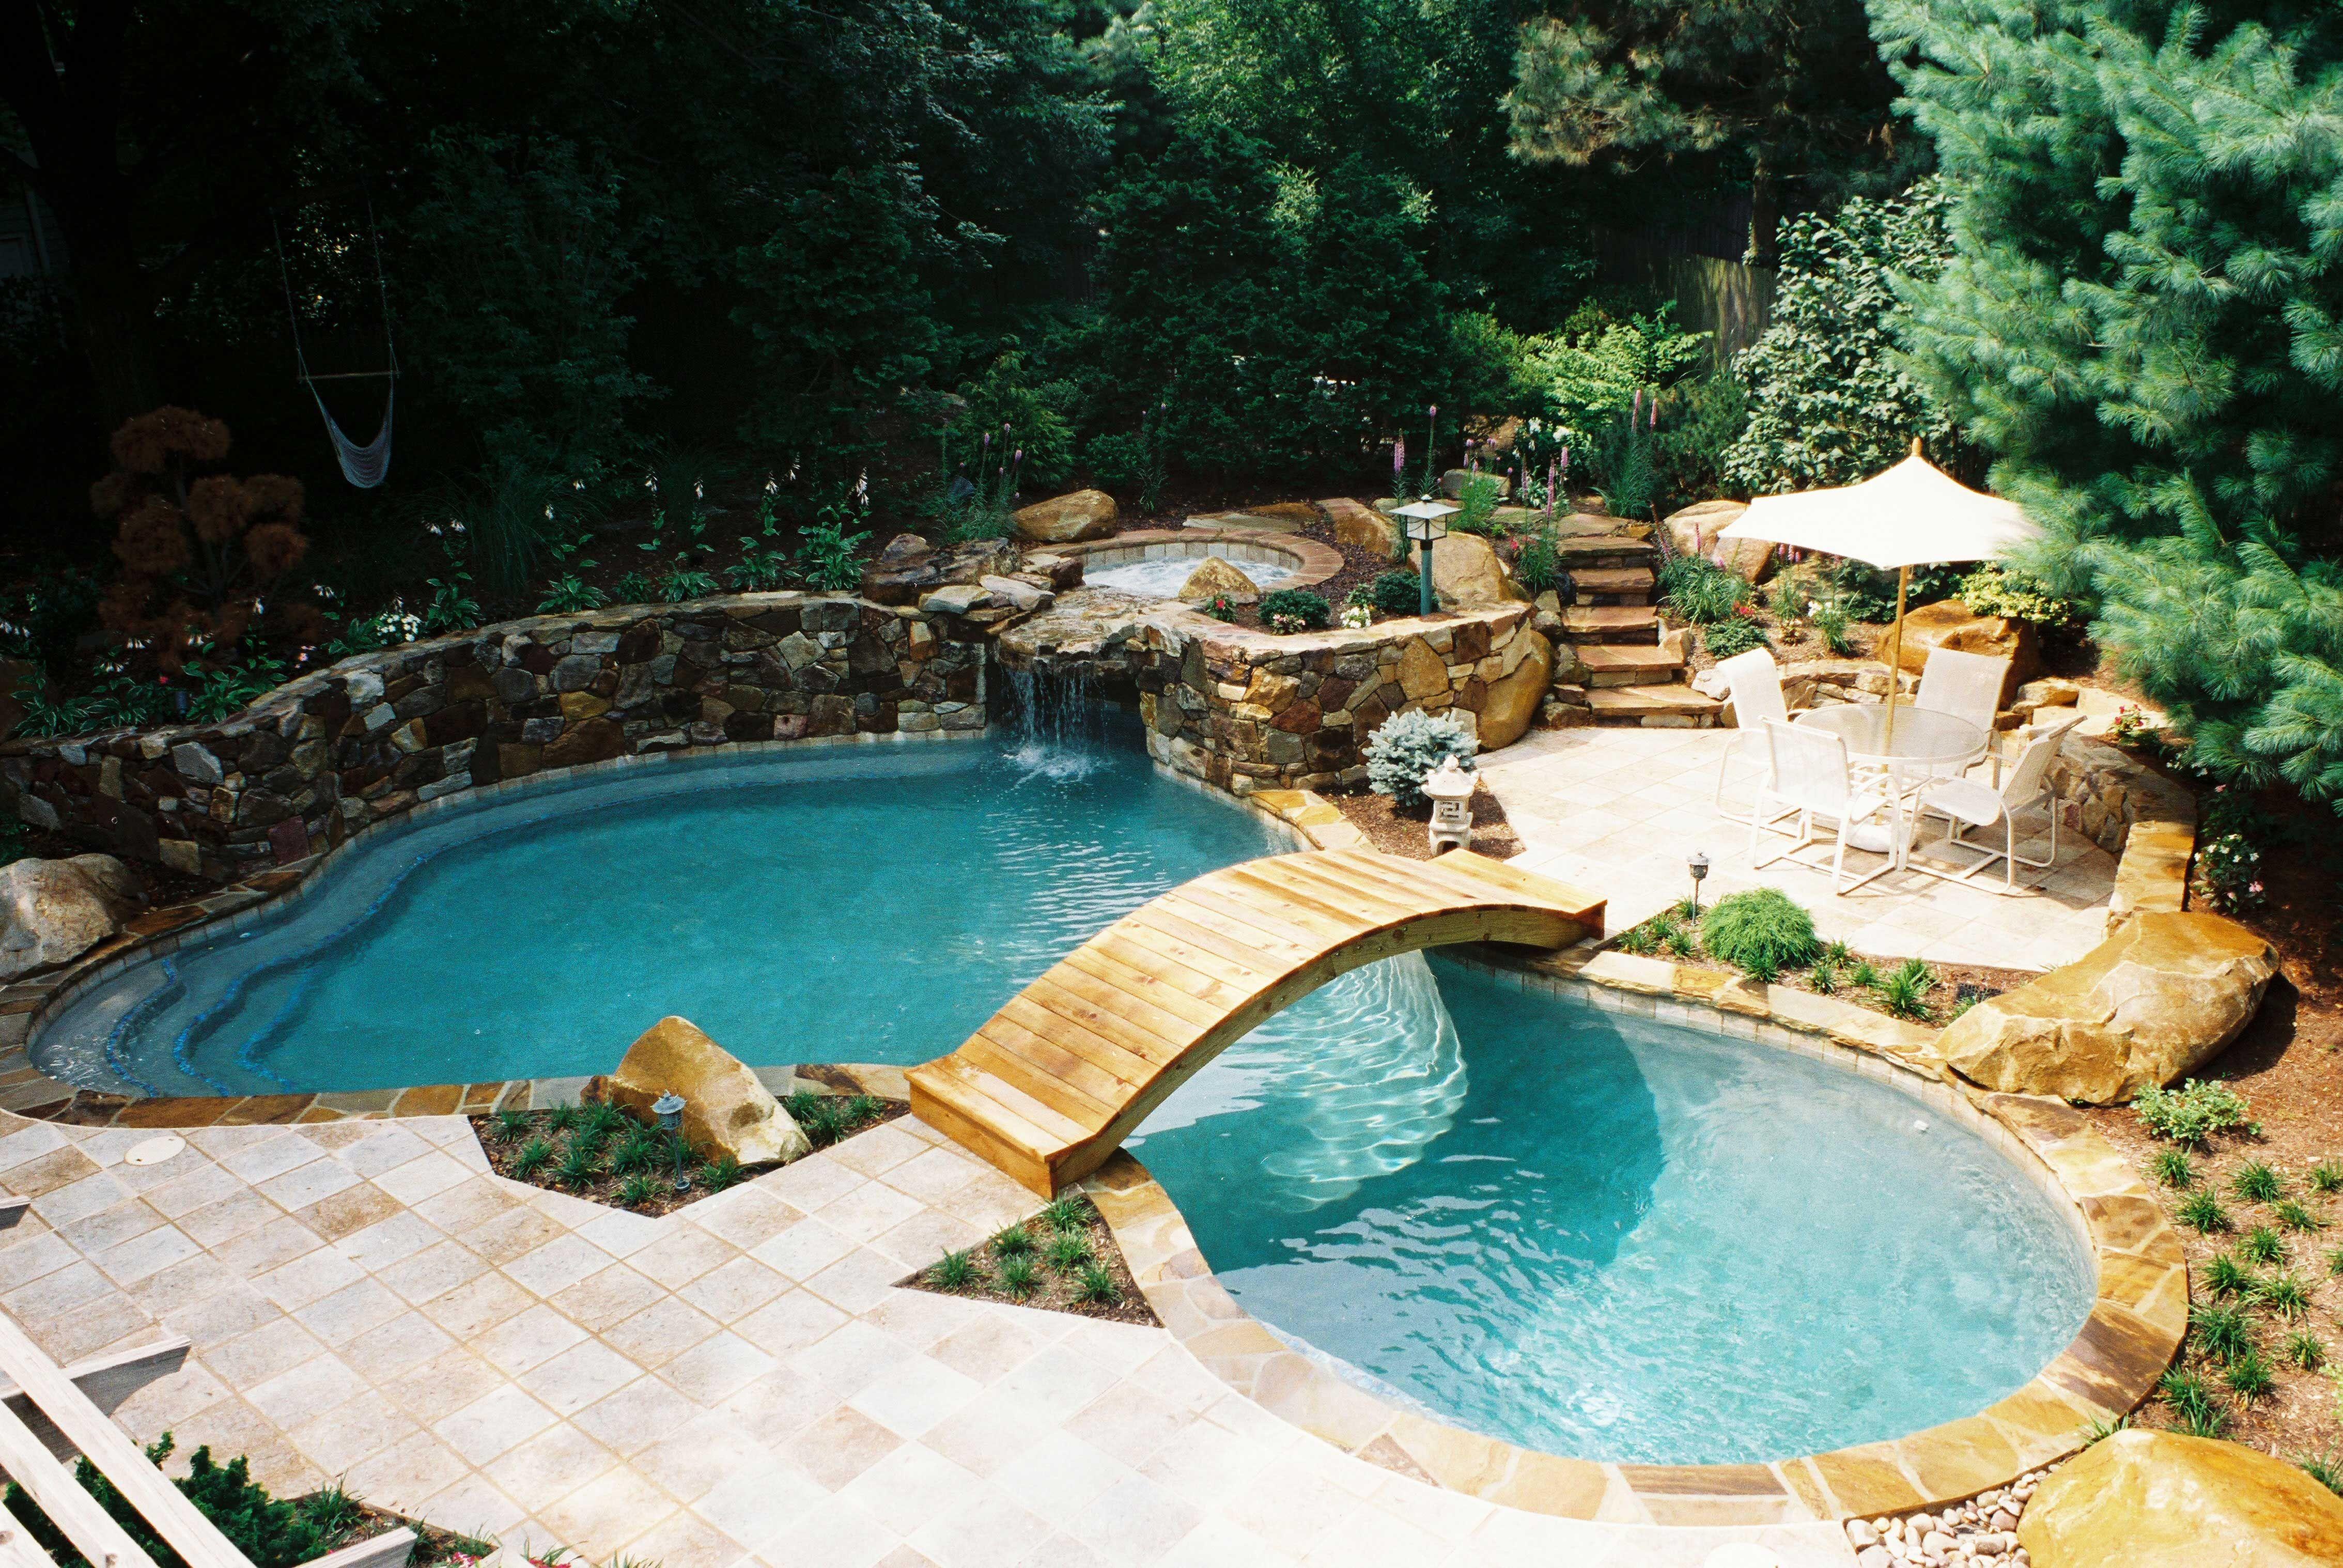 Armond aquatech pools swimming pool builder custom